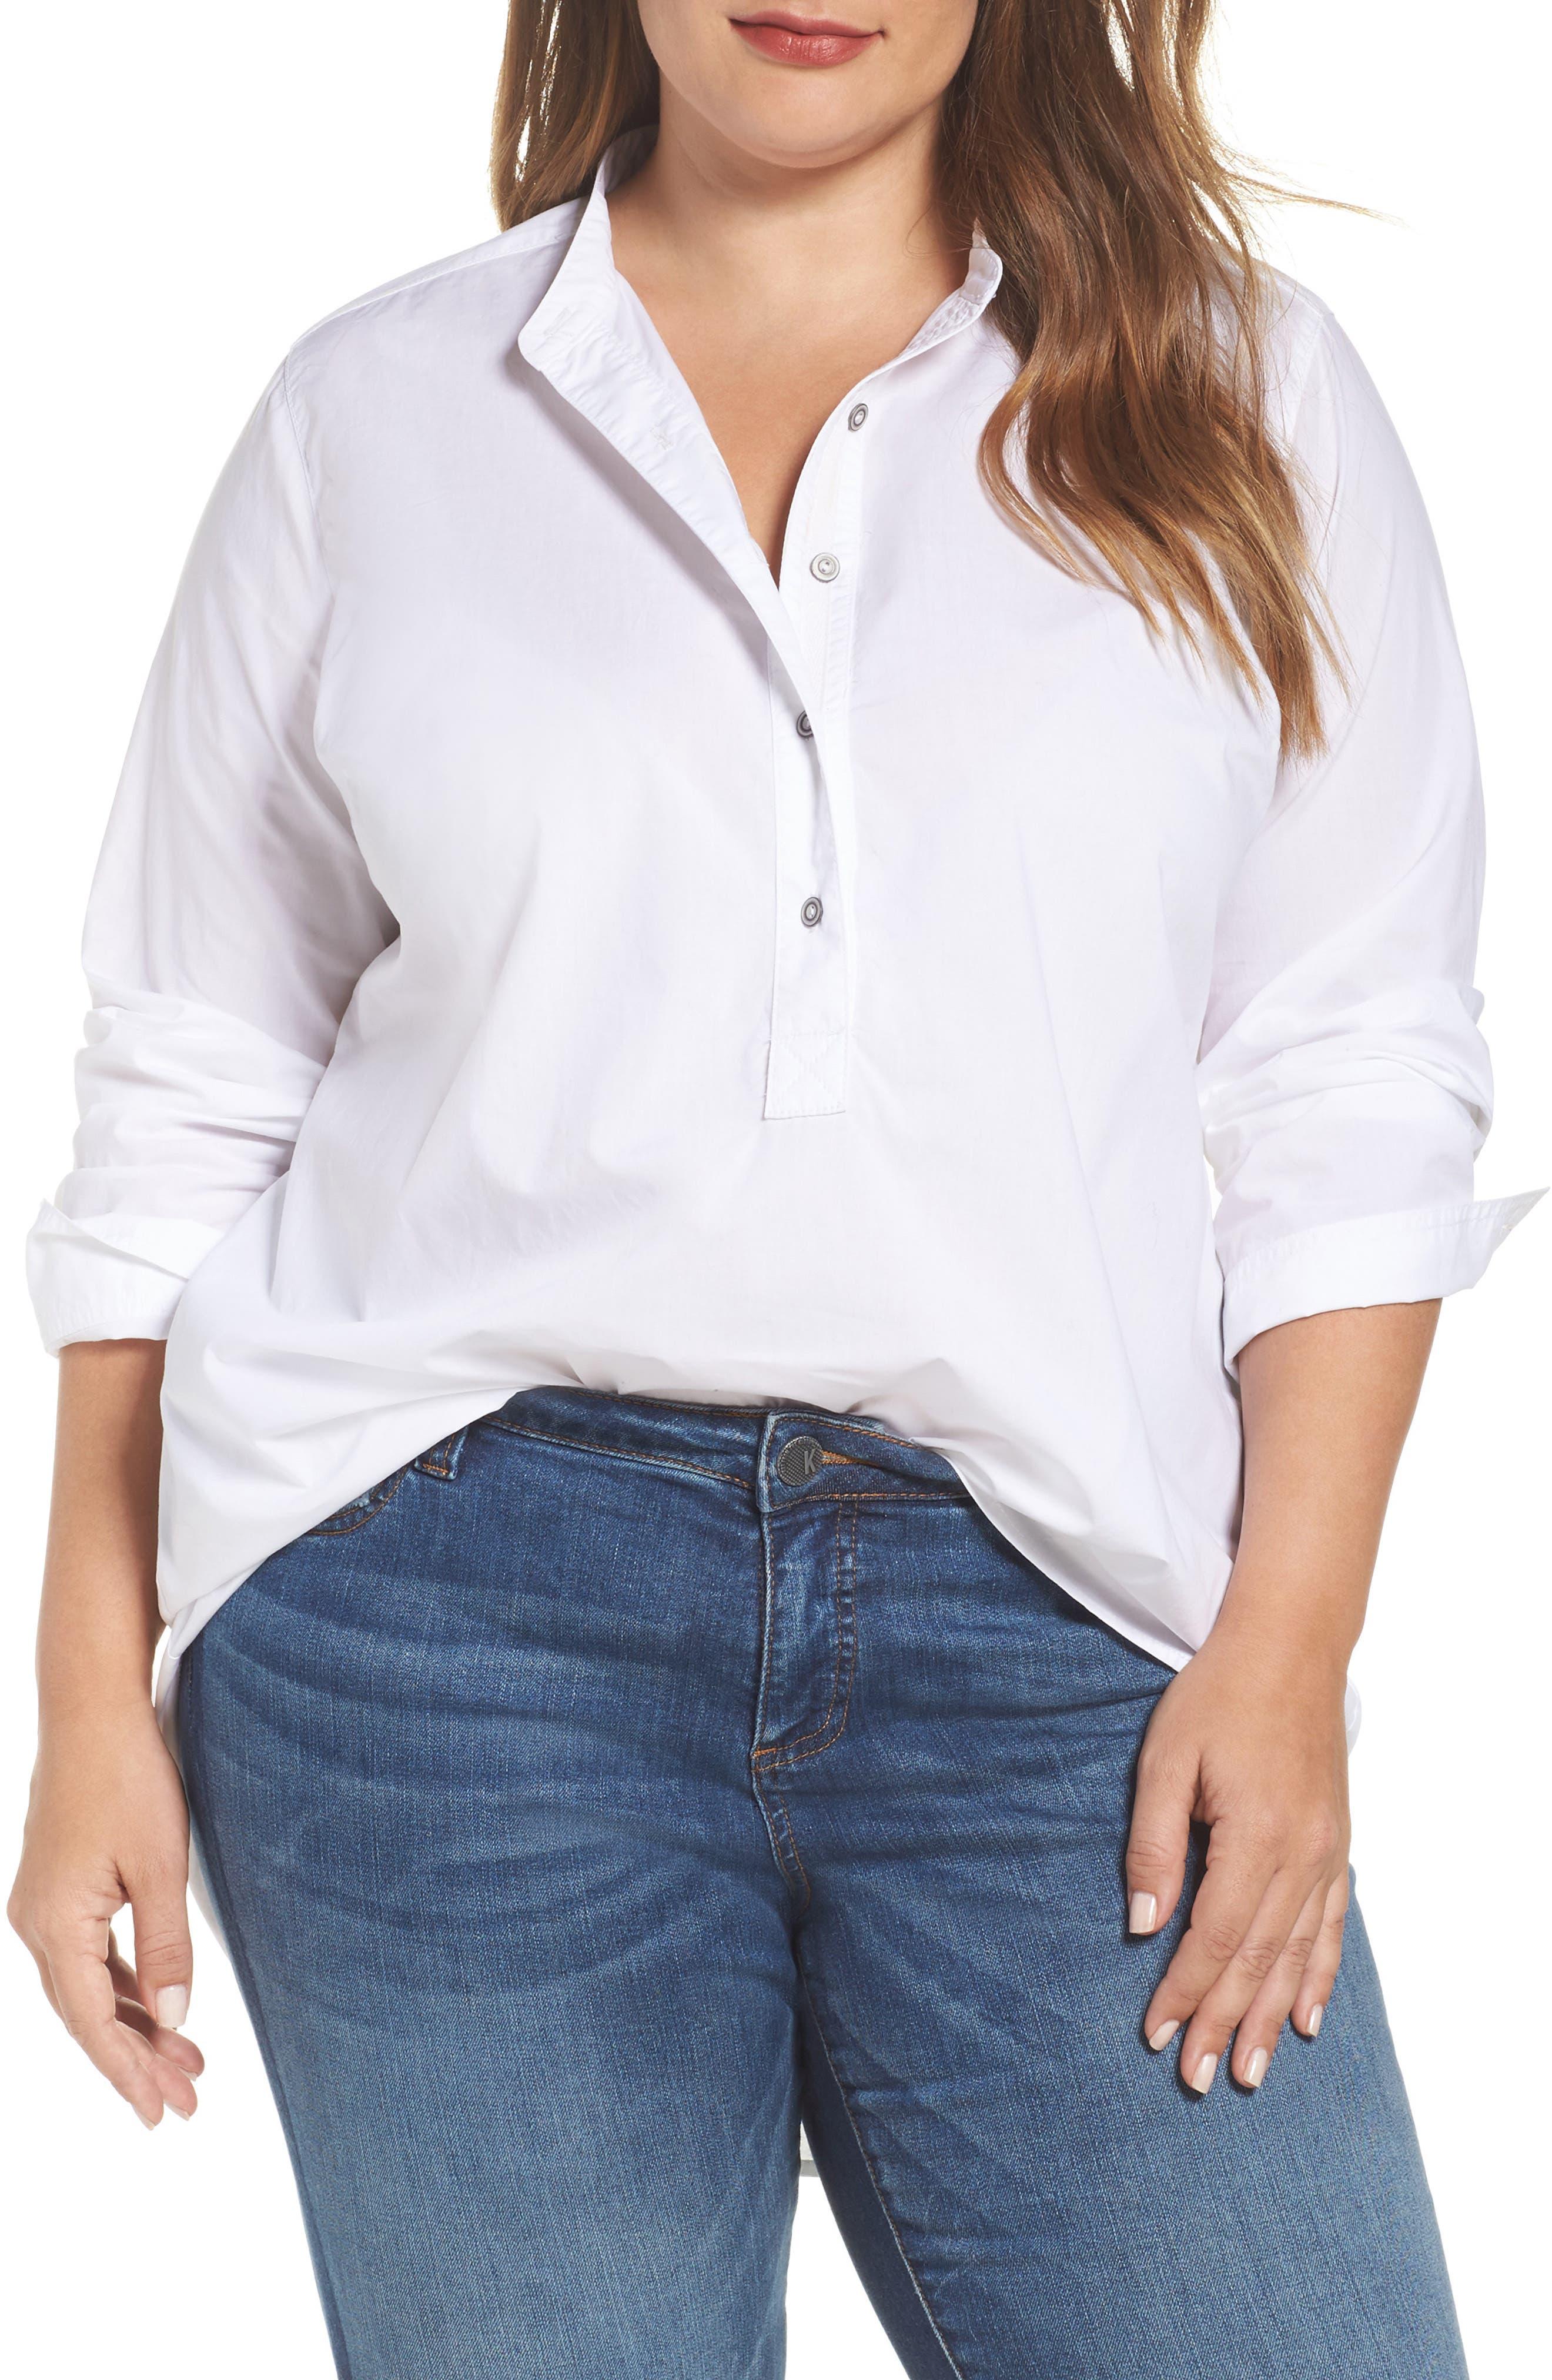 Alternate Image 1 Selected - Caslon® Popover Shirt (Plus Size)